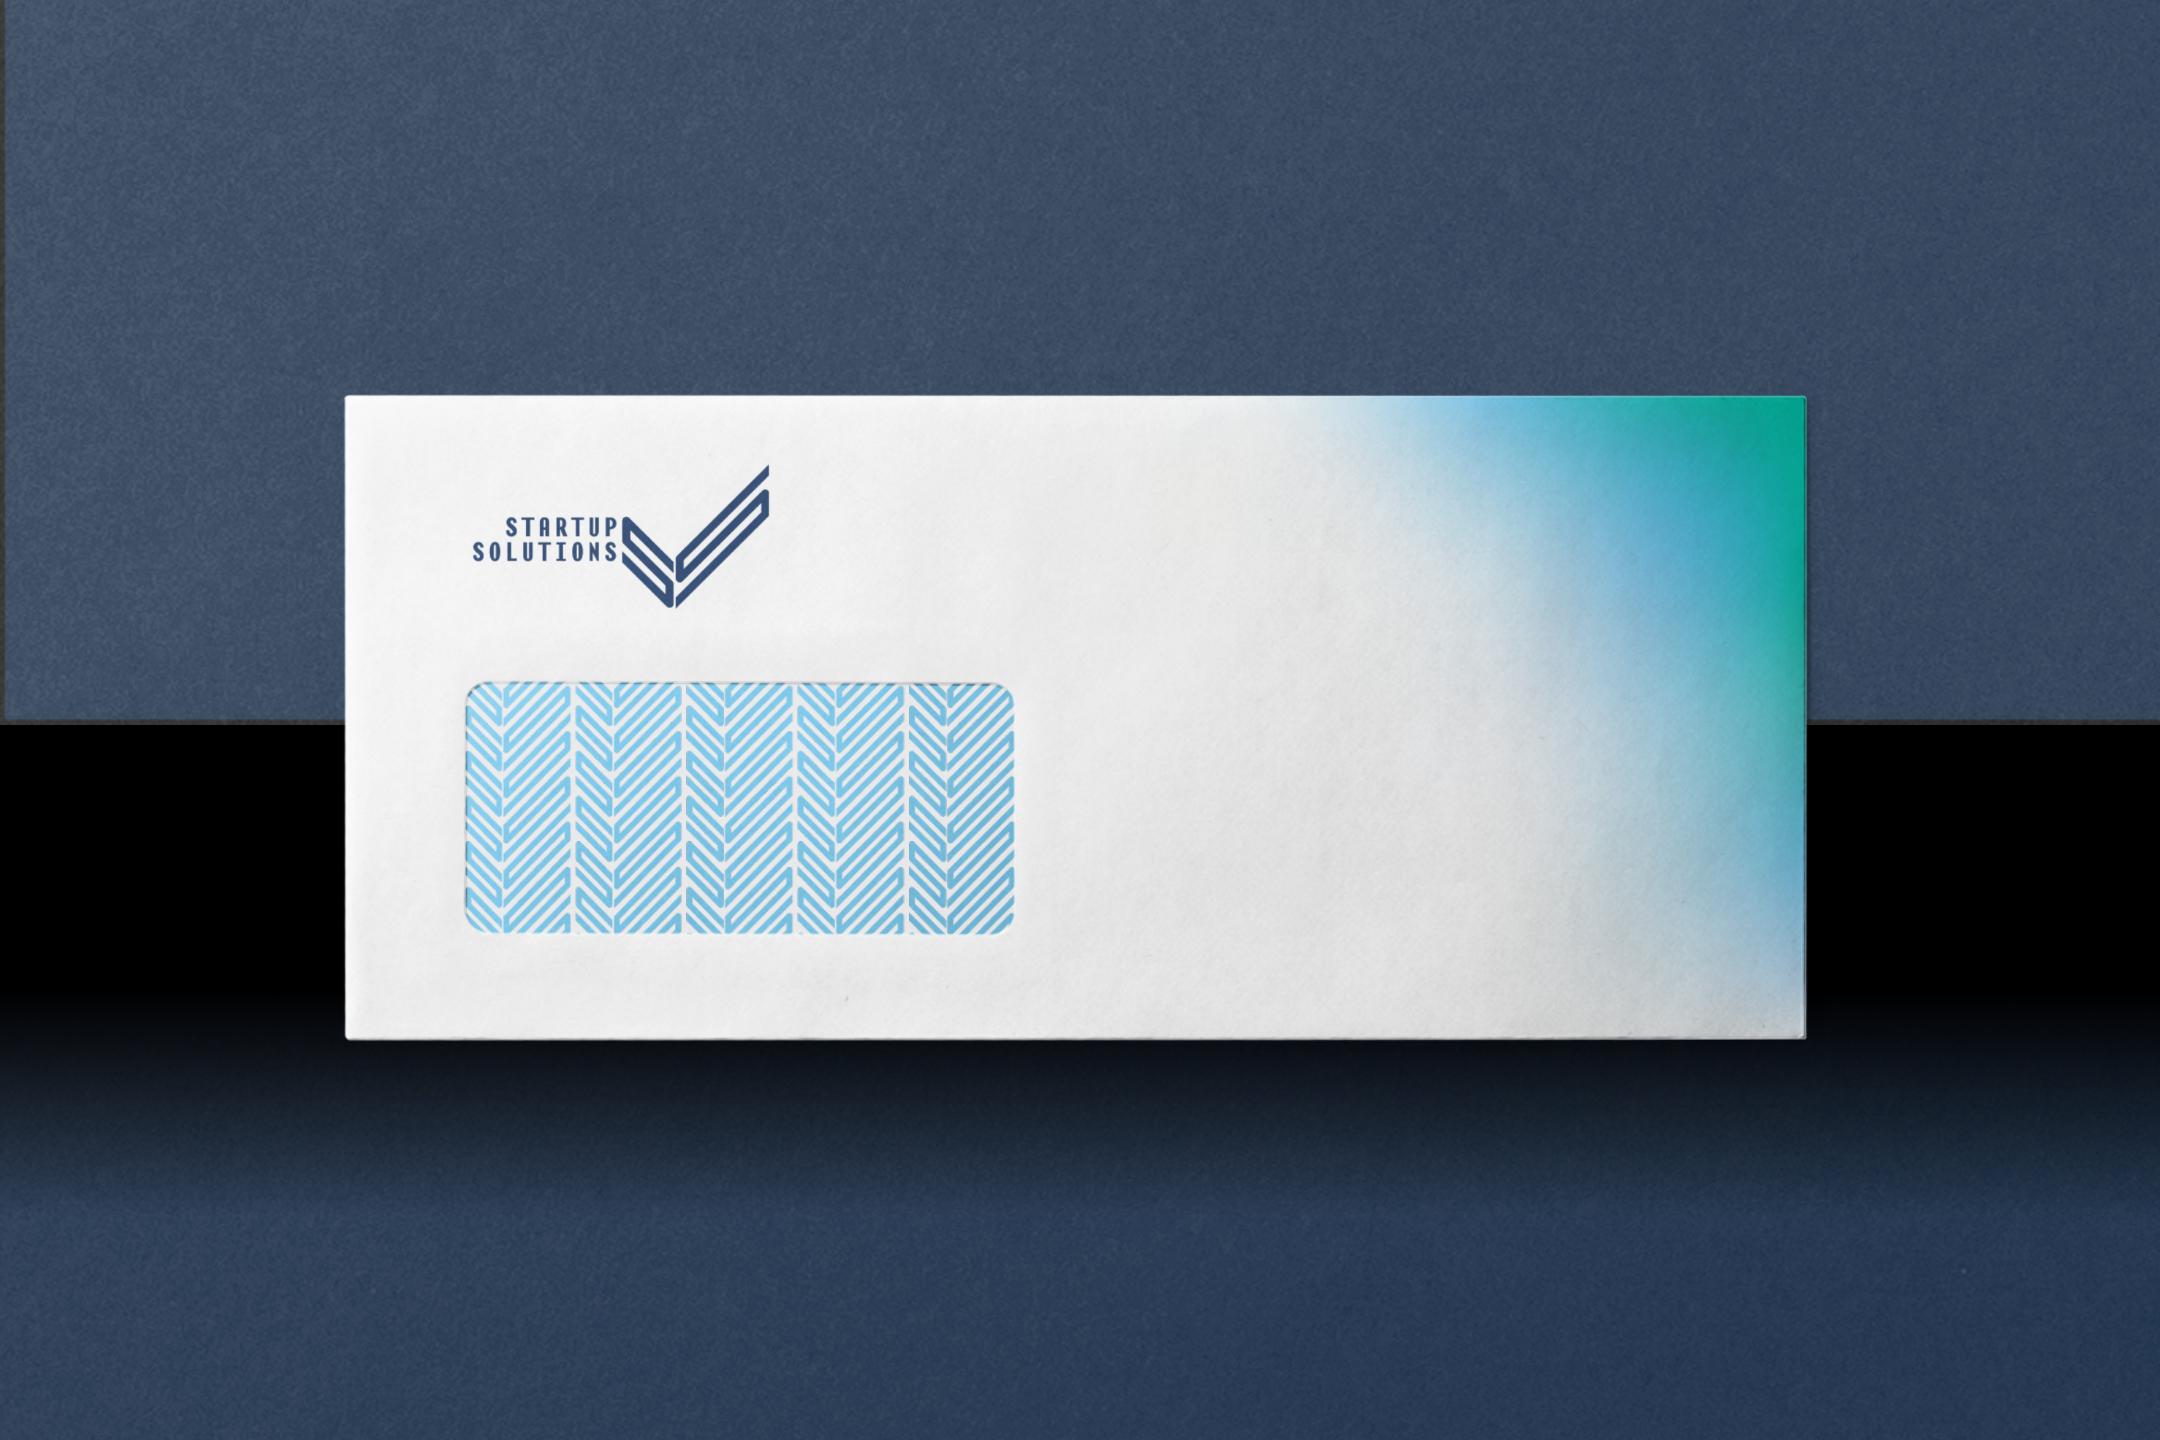 startup-solutions-envelope.png